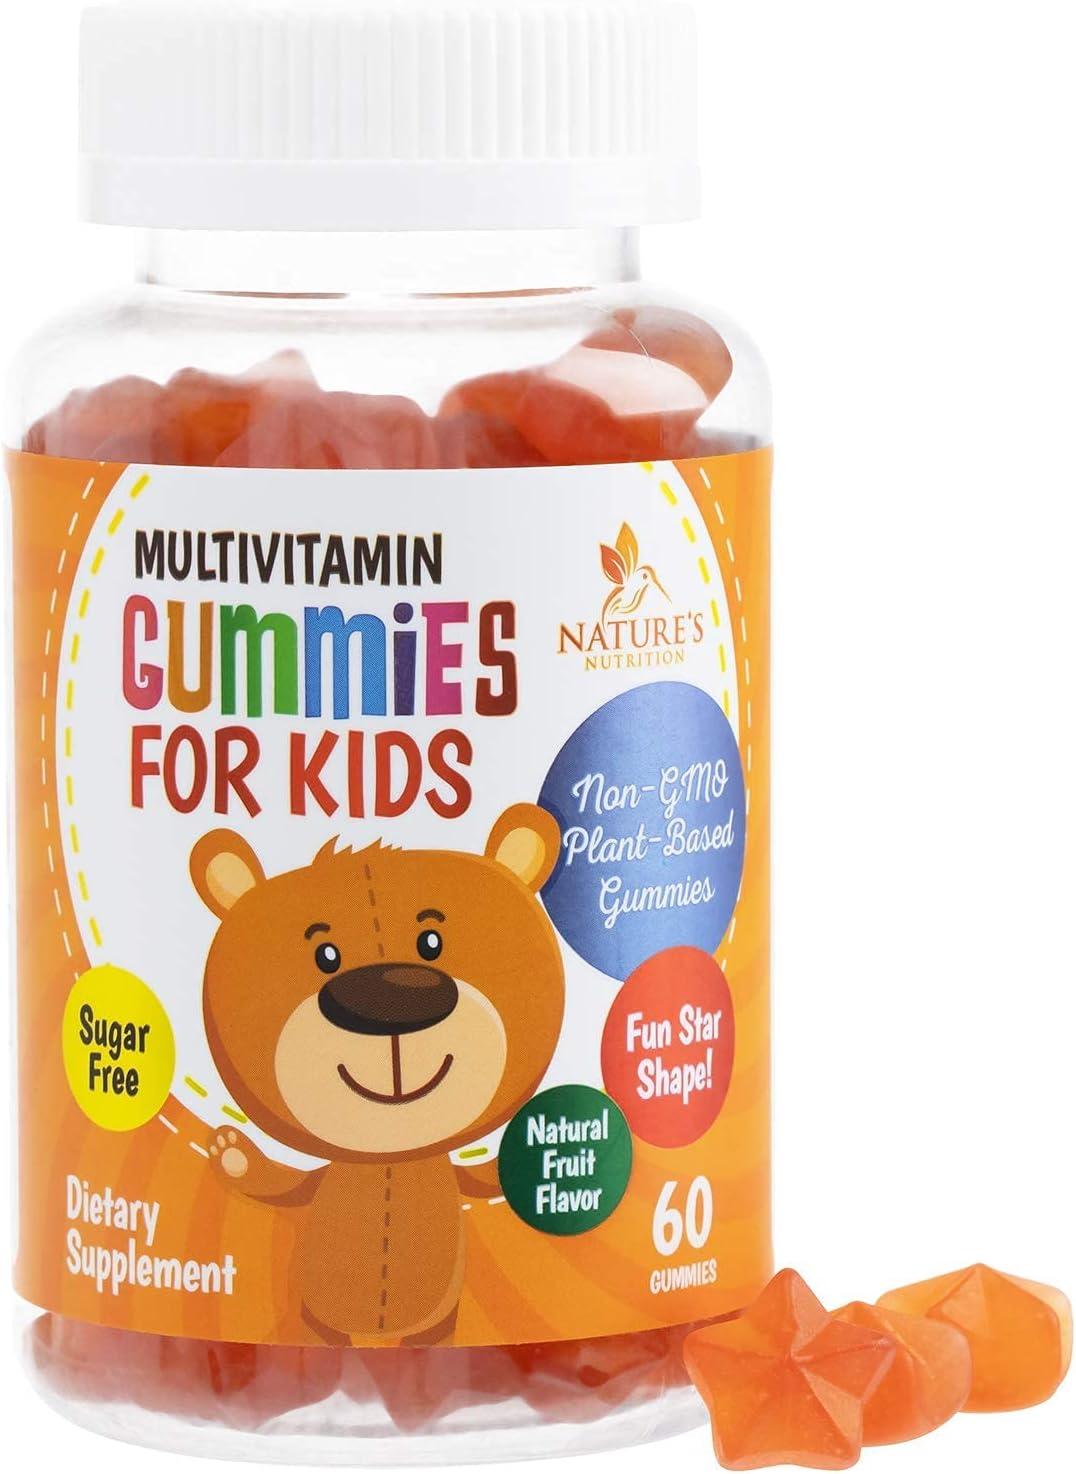 Kids Multivitamin Wholesale Gummies for Immune - Support Natural Complete Sale item